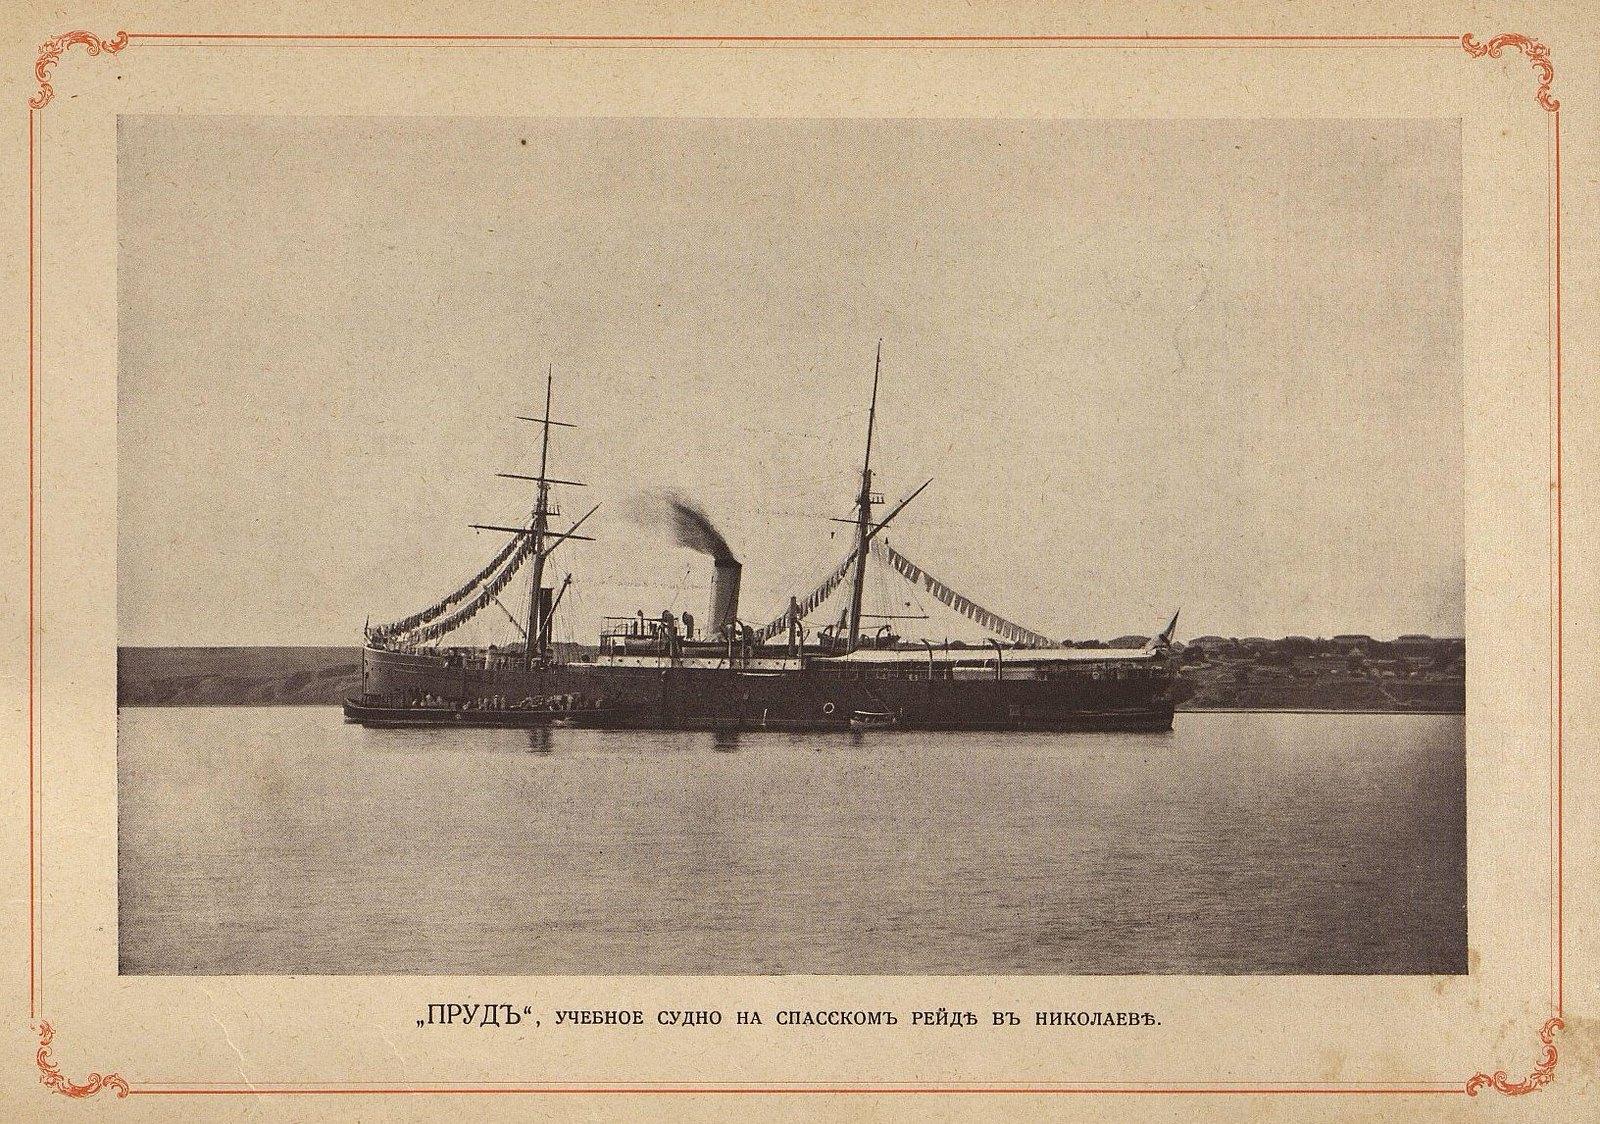 Учебное судно «Пруд» на Спасском рейде в Николаеве